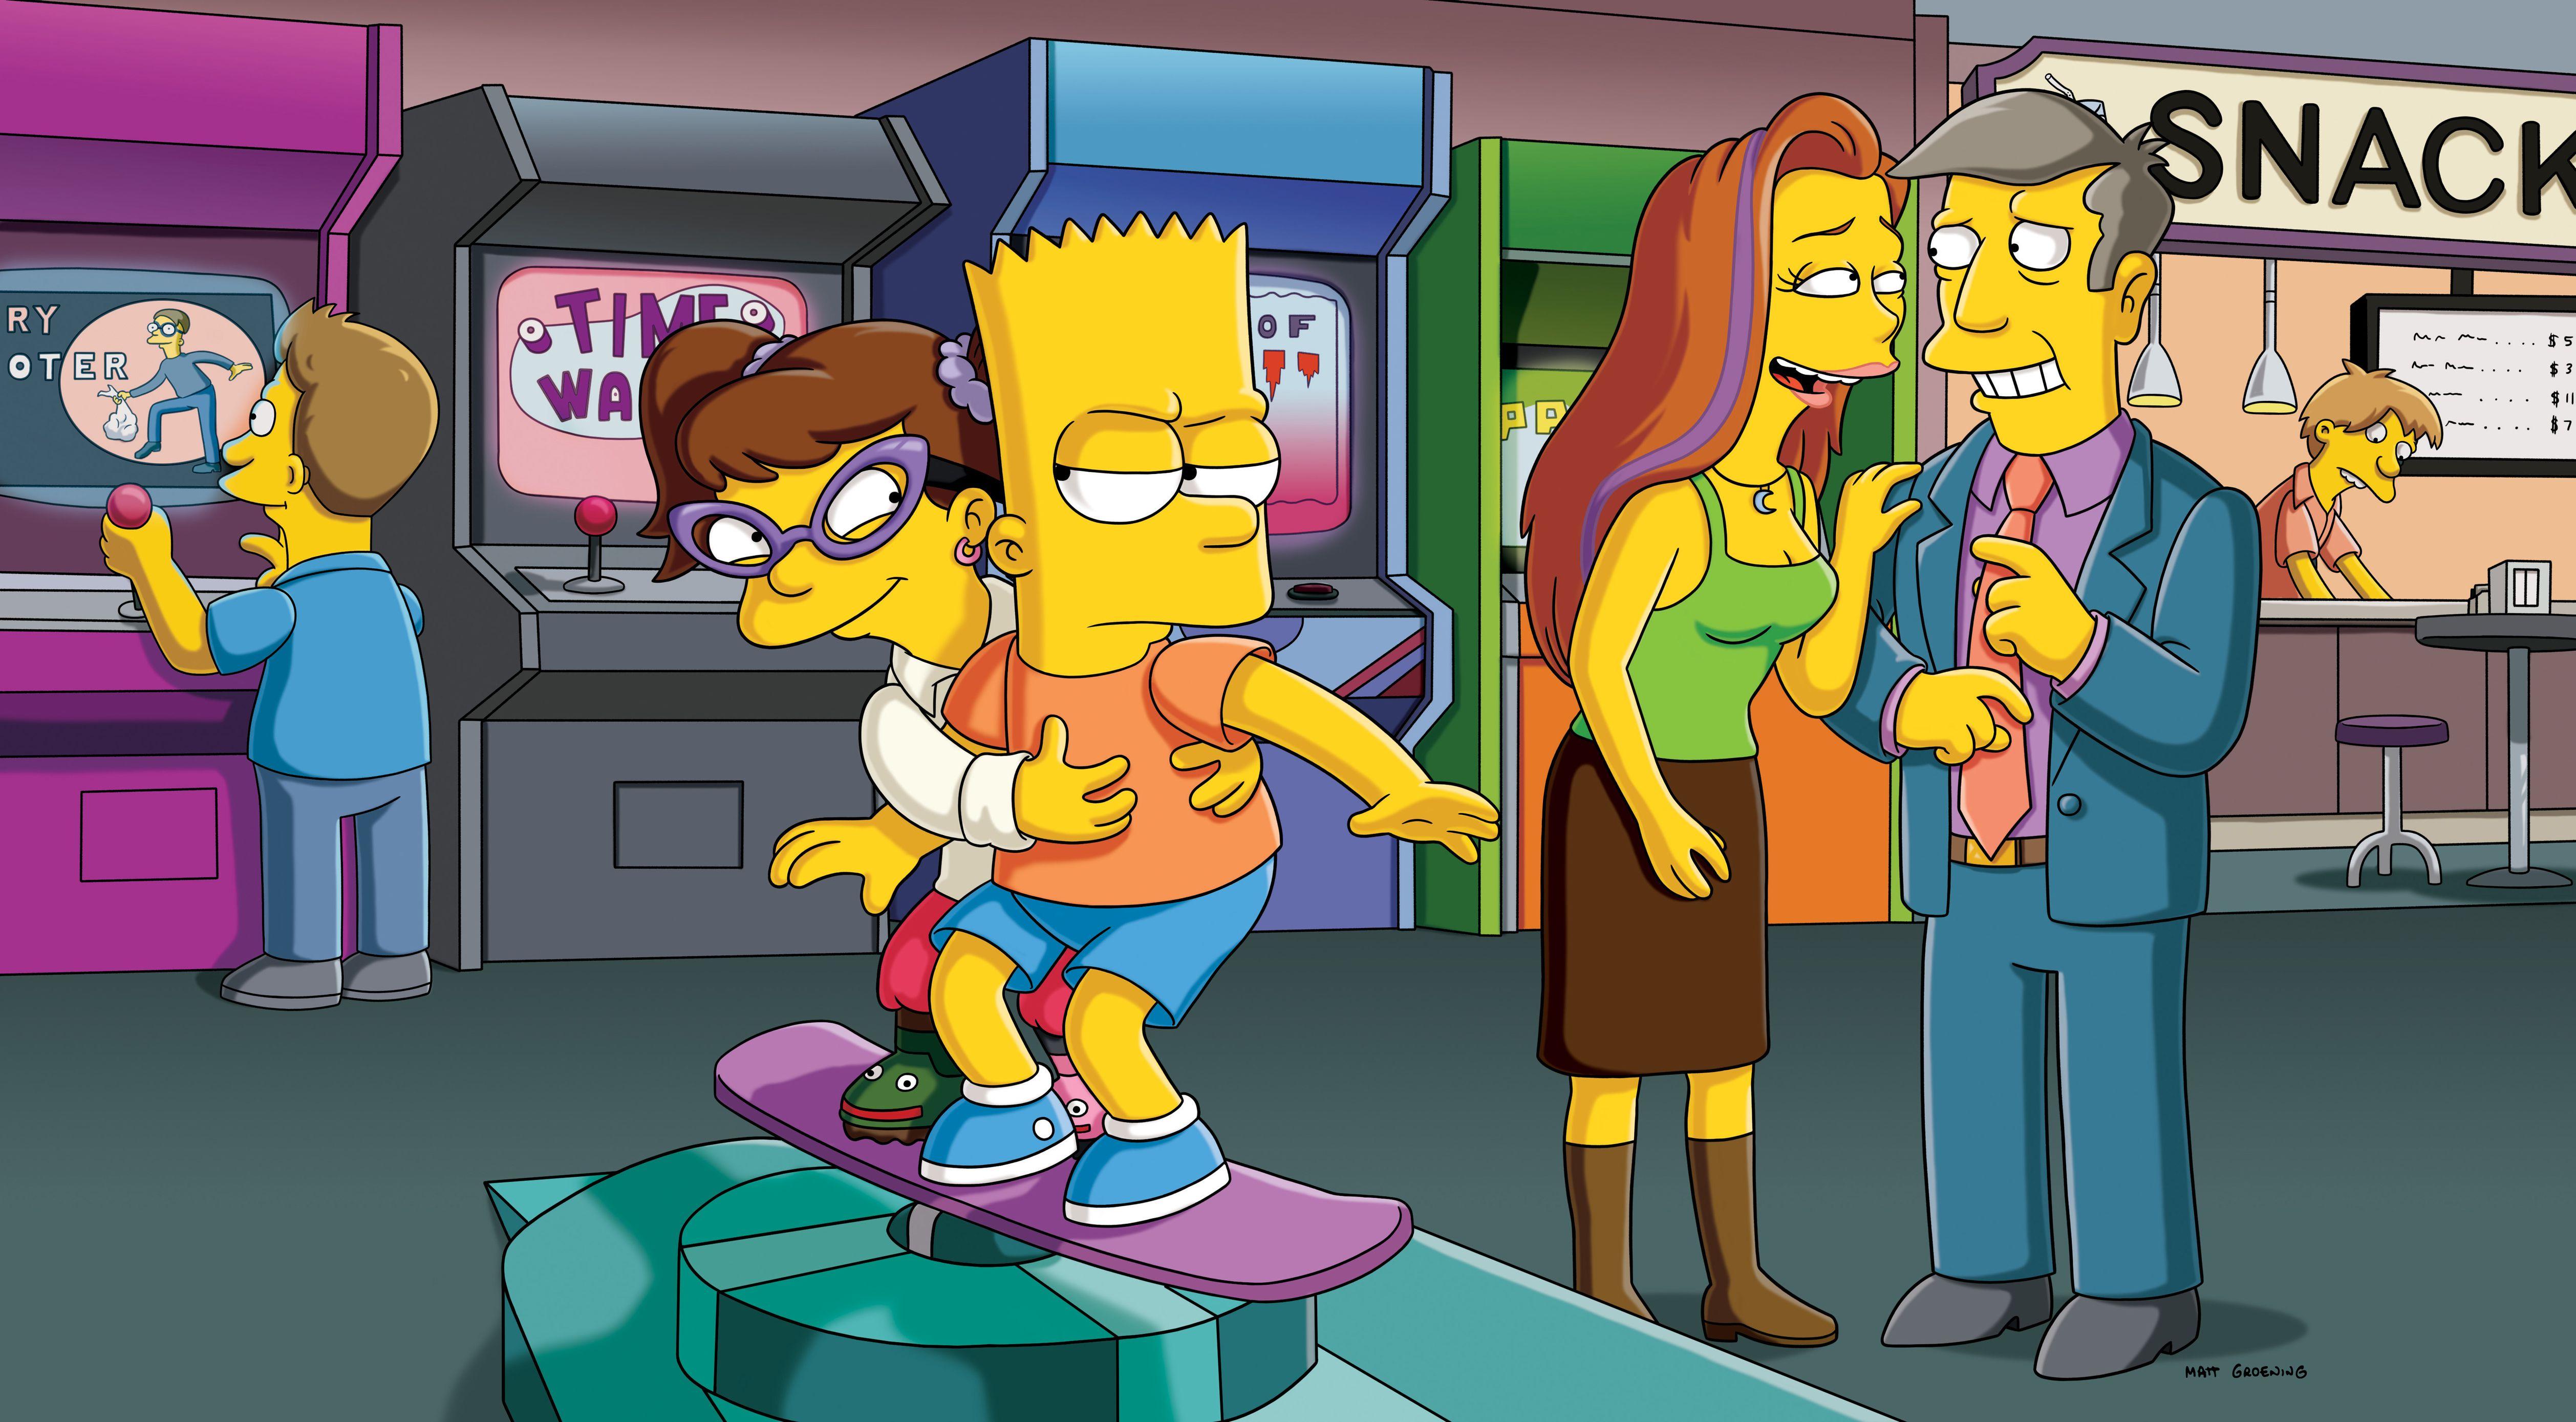 Melody, Bart, Ms. Juniper and Principal Skinner